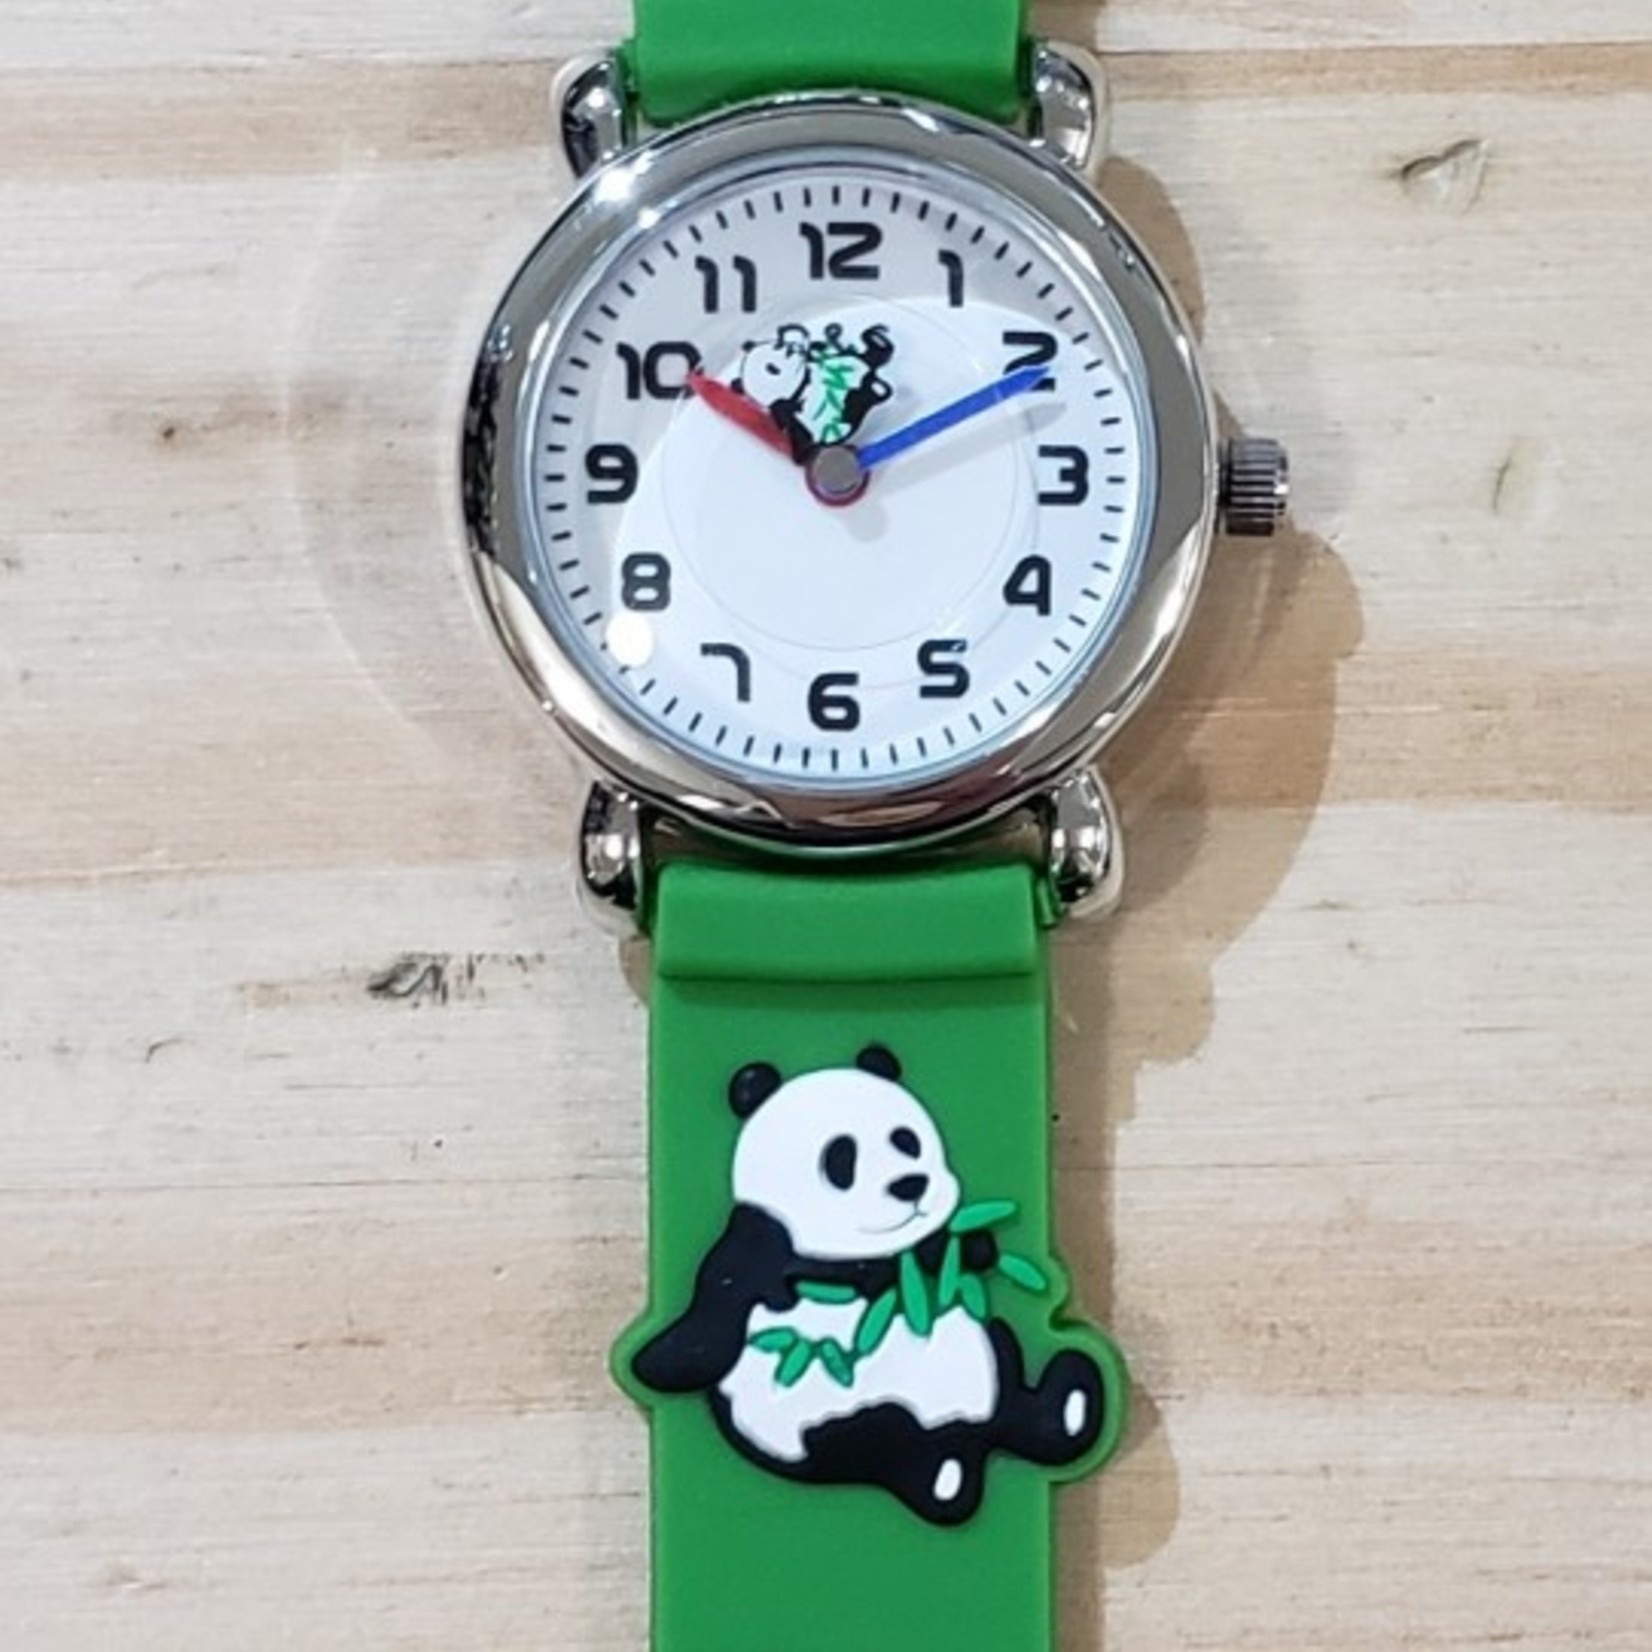 D&S Imports Watch - Panda